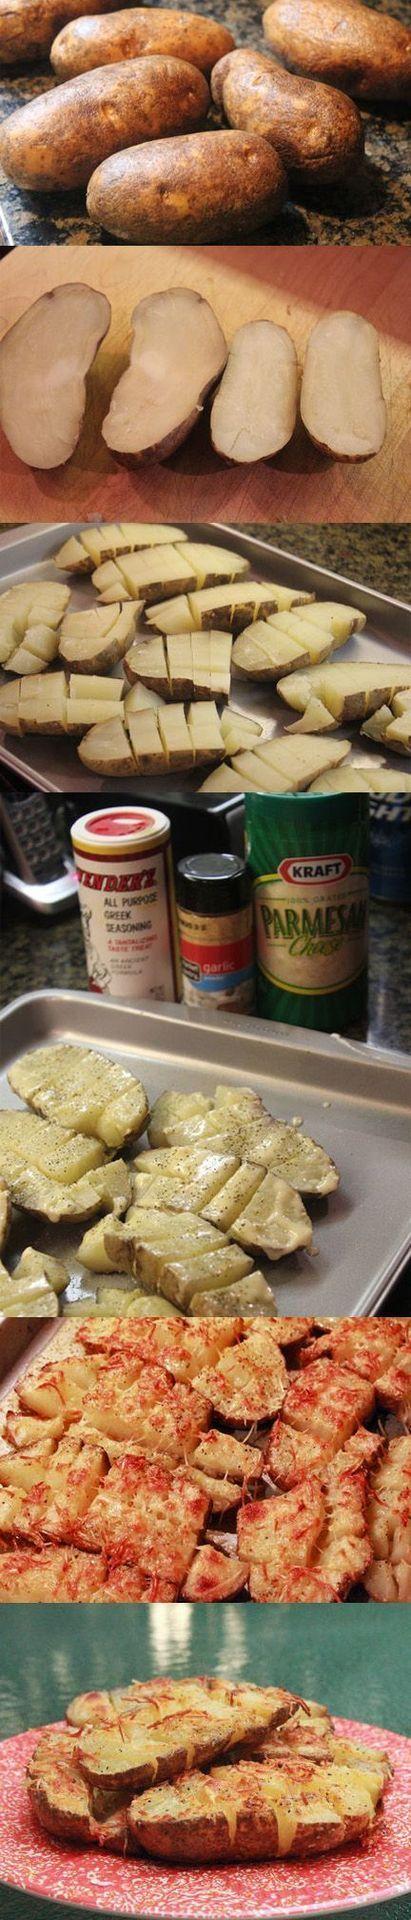 Seasoned Roasted Potatoes - Denise Healthy Eating Recipes